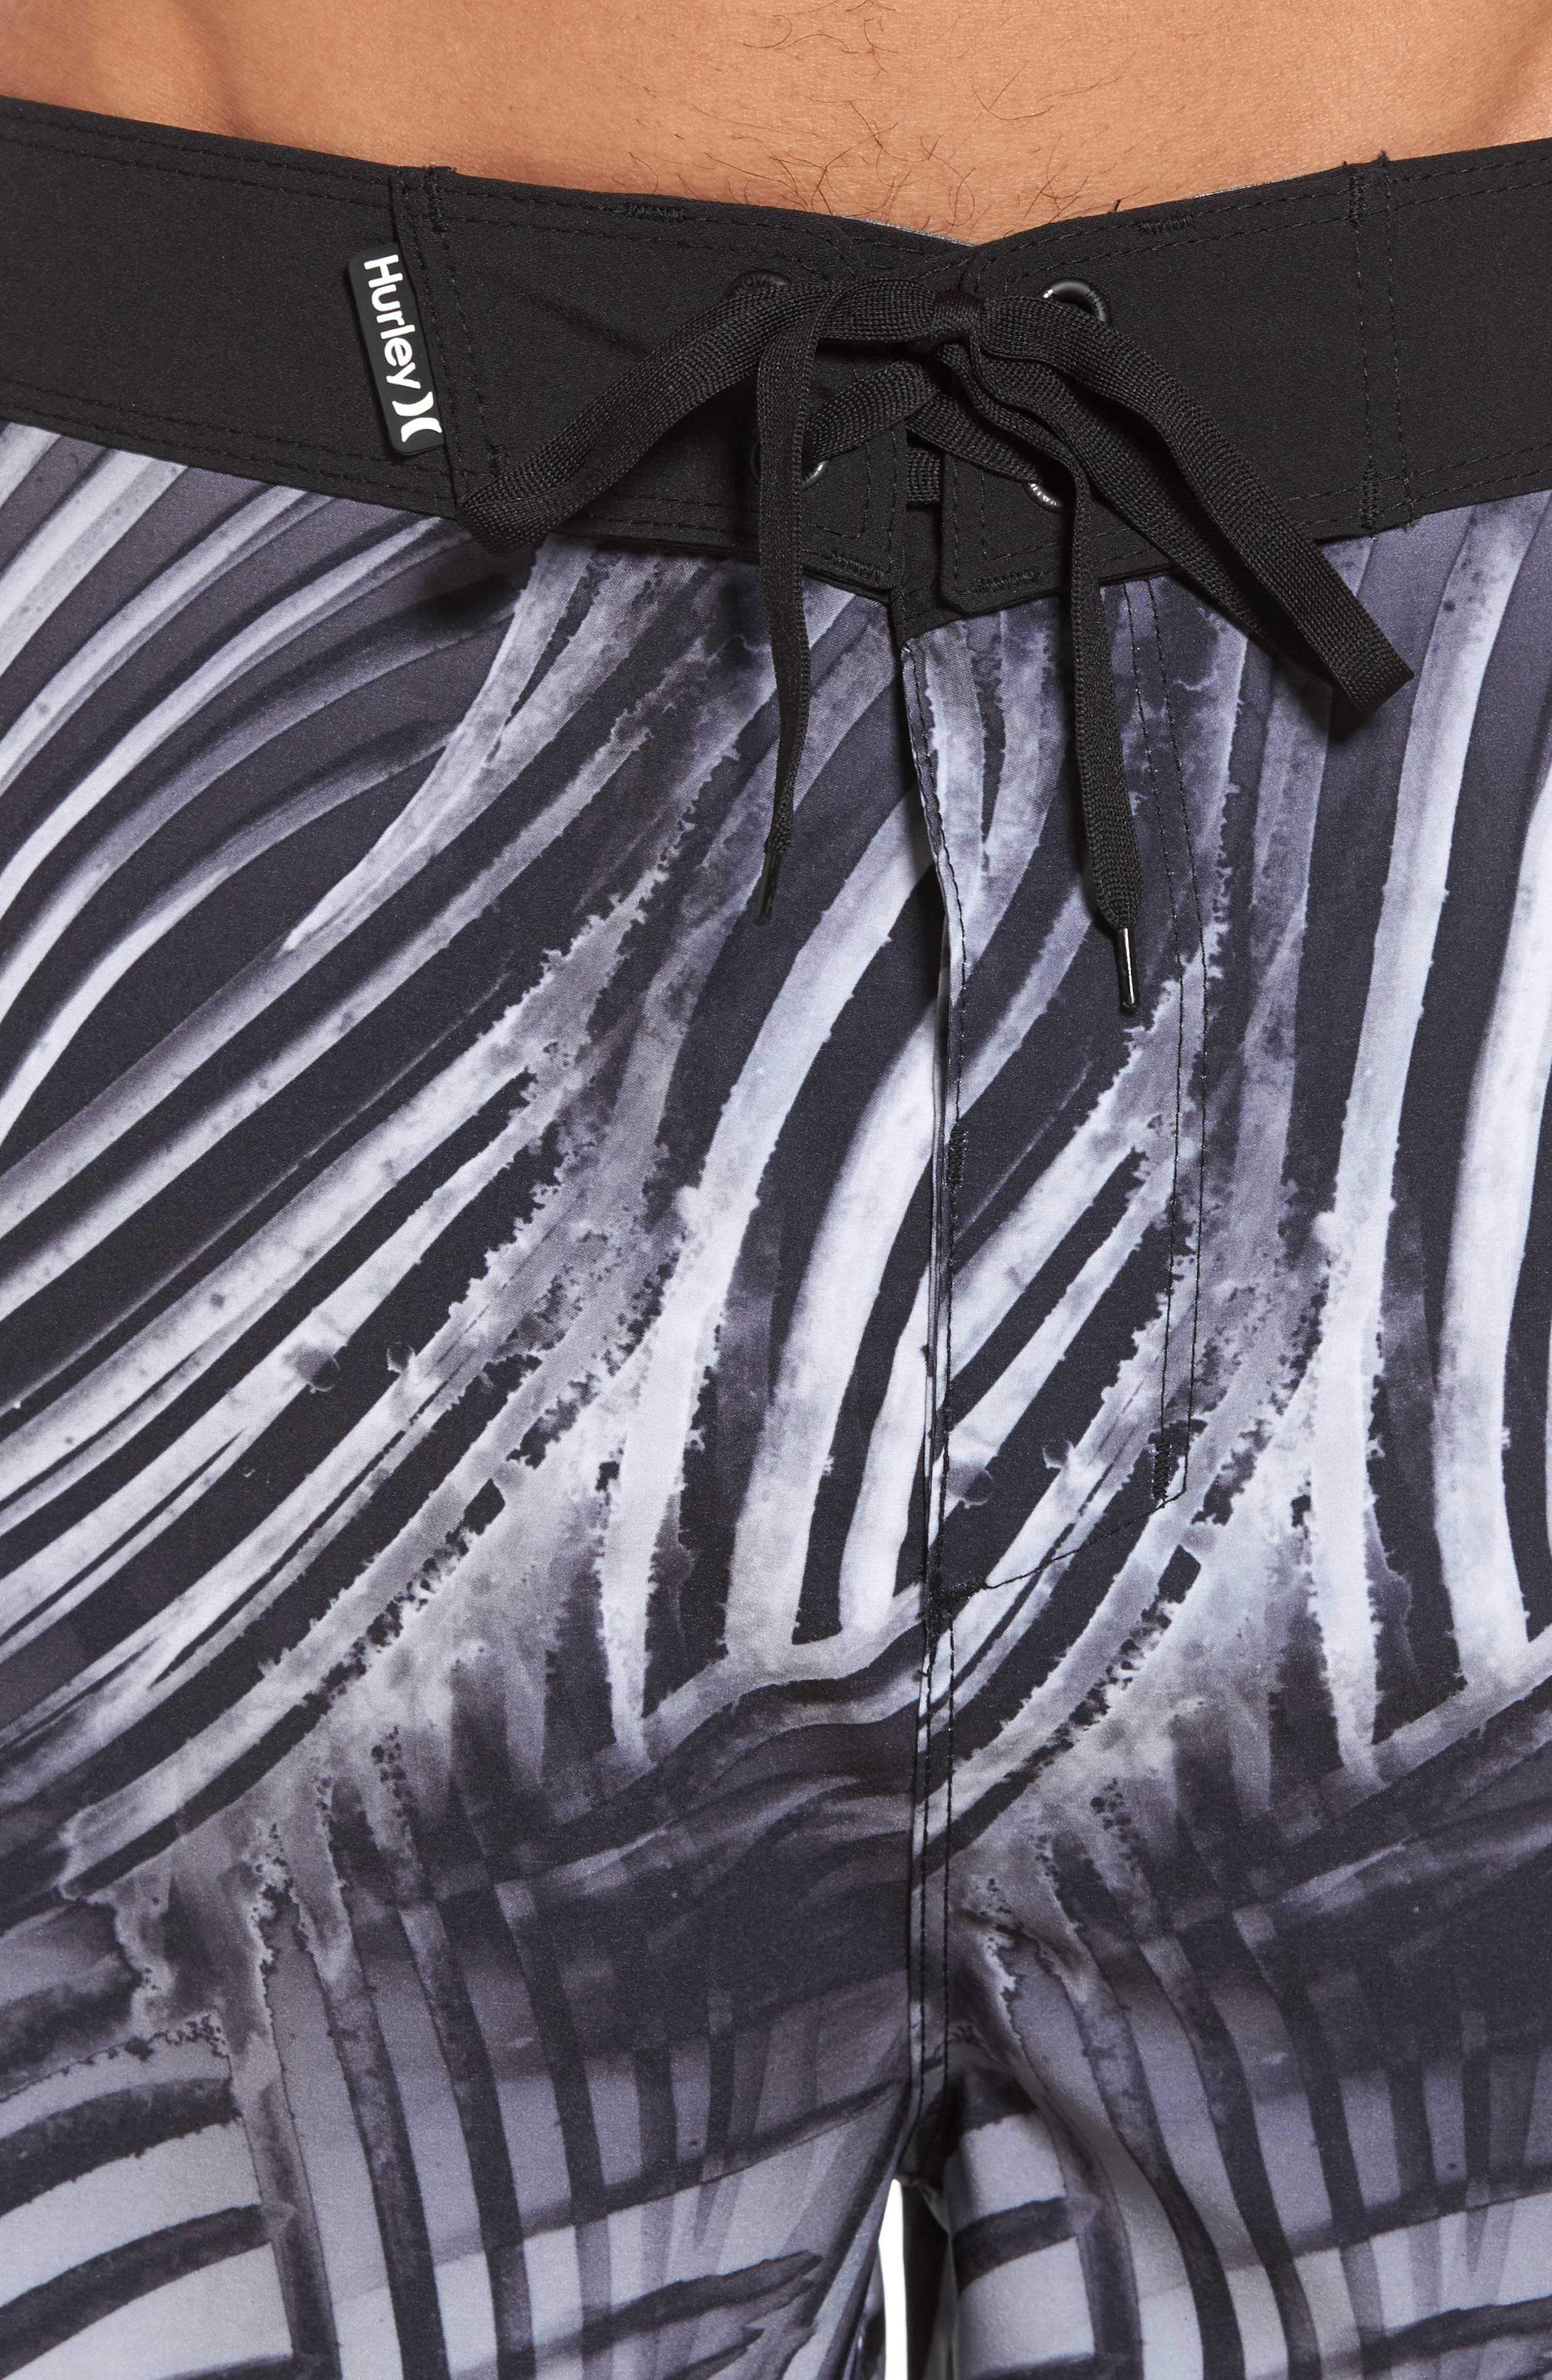 Phantom Crest Board Shorts,                             Alternate thumbnail 4, color,                             010